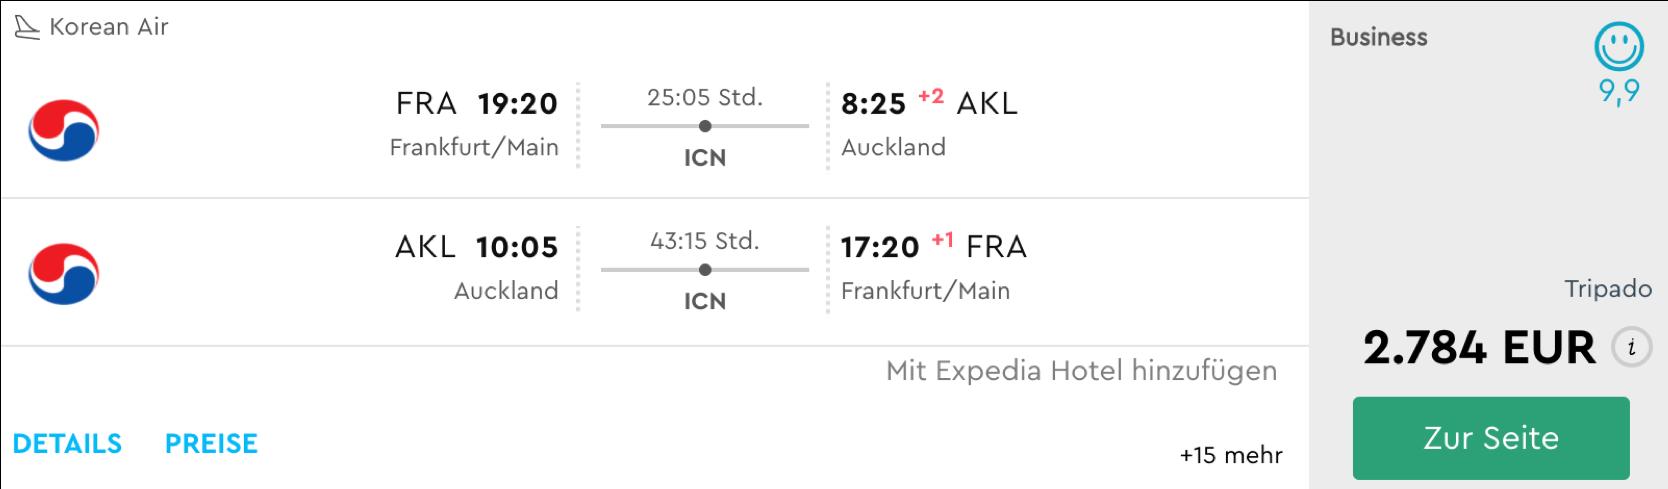 Korean Air business Class nach Australien und Neuseeland fliegen